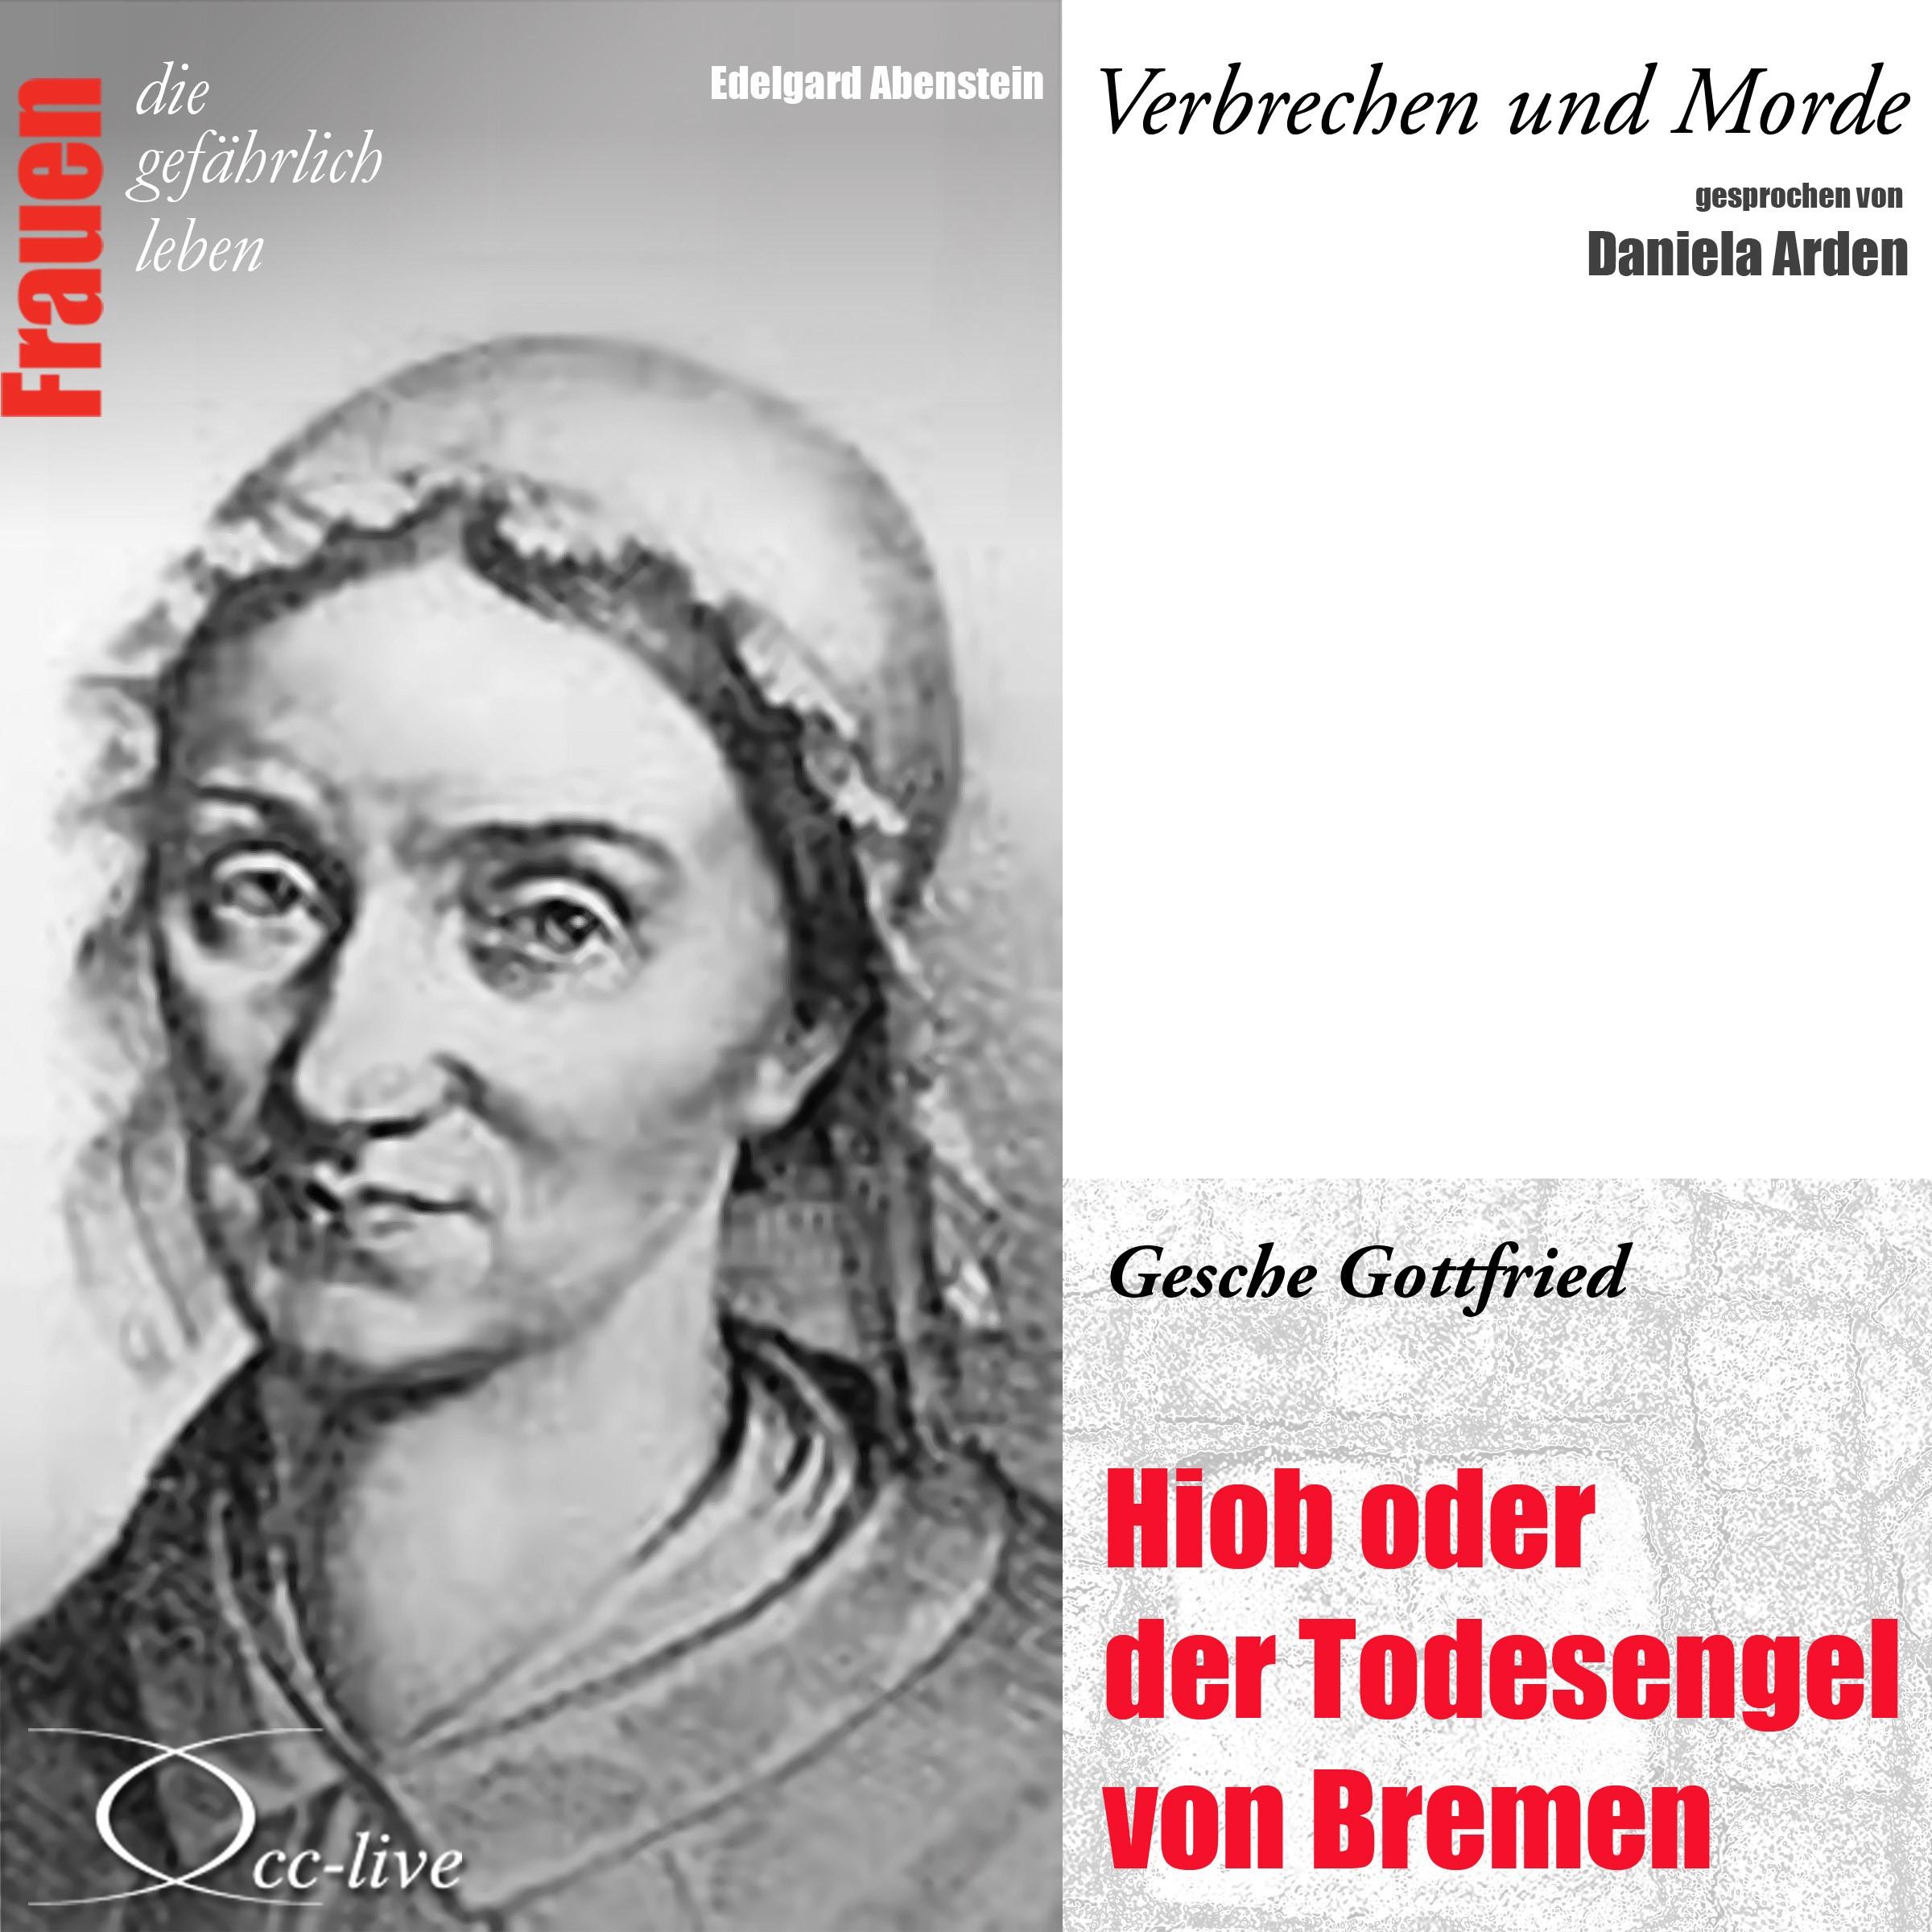 Bremen singles reihe frauen [PUNIQRANDLINE-(au-dating-names.txt) 49